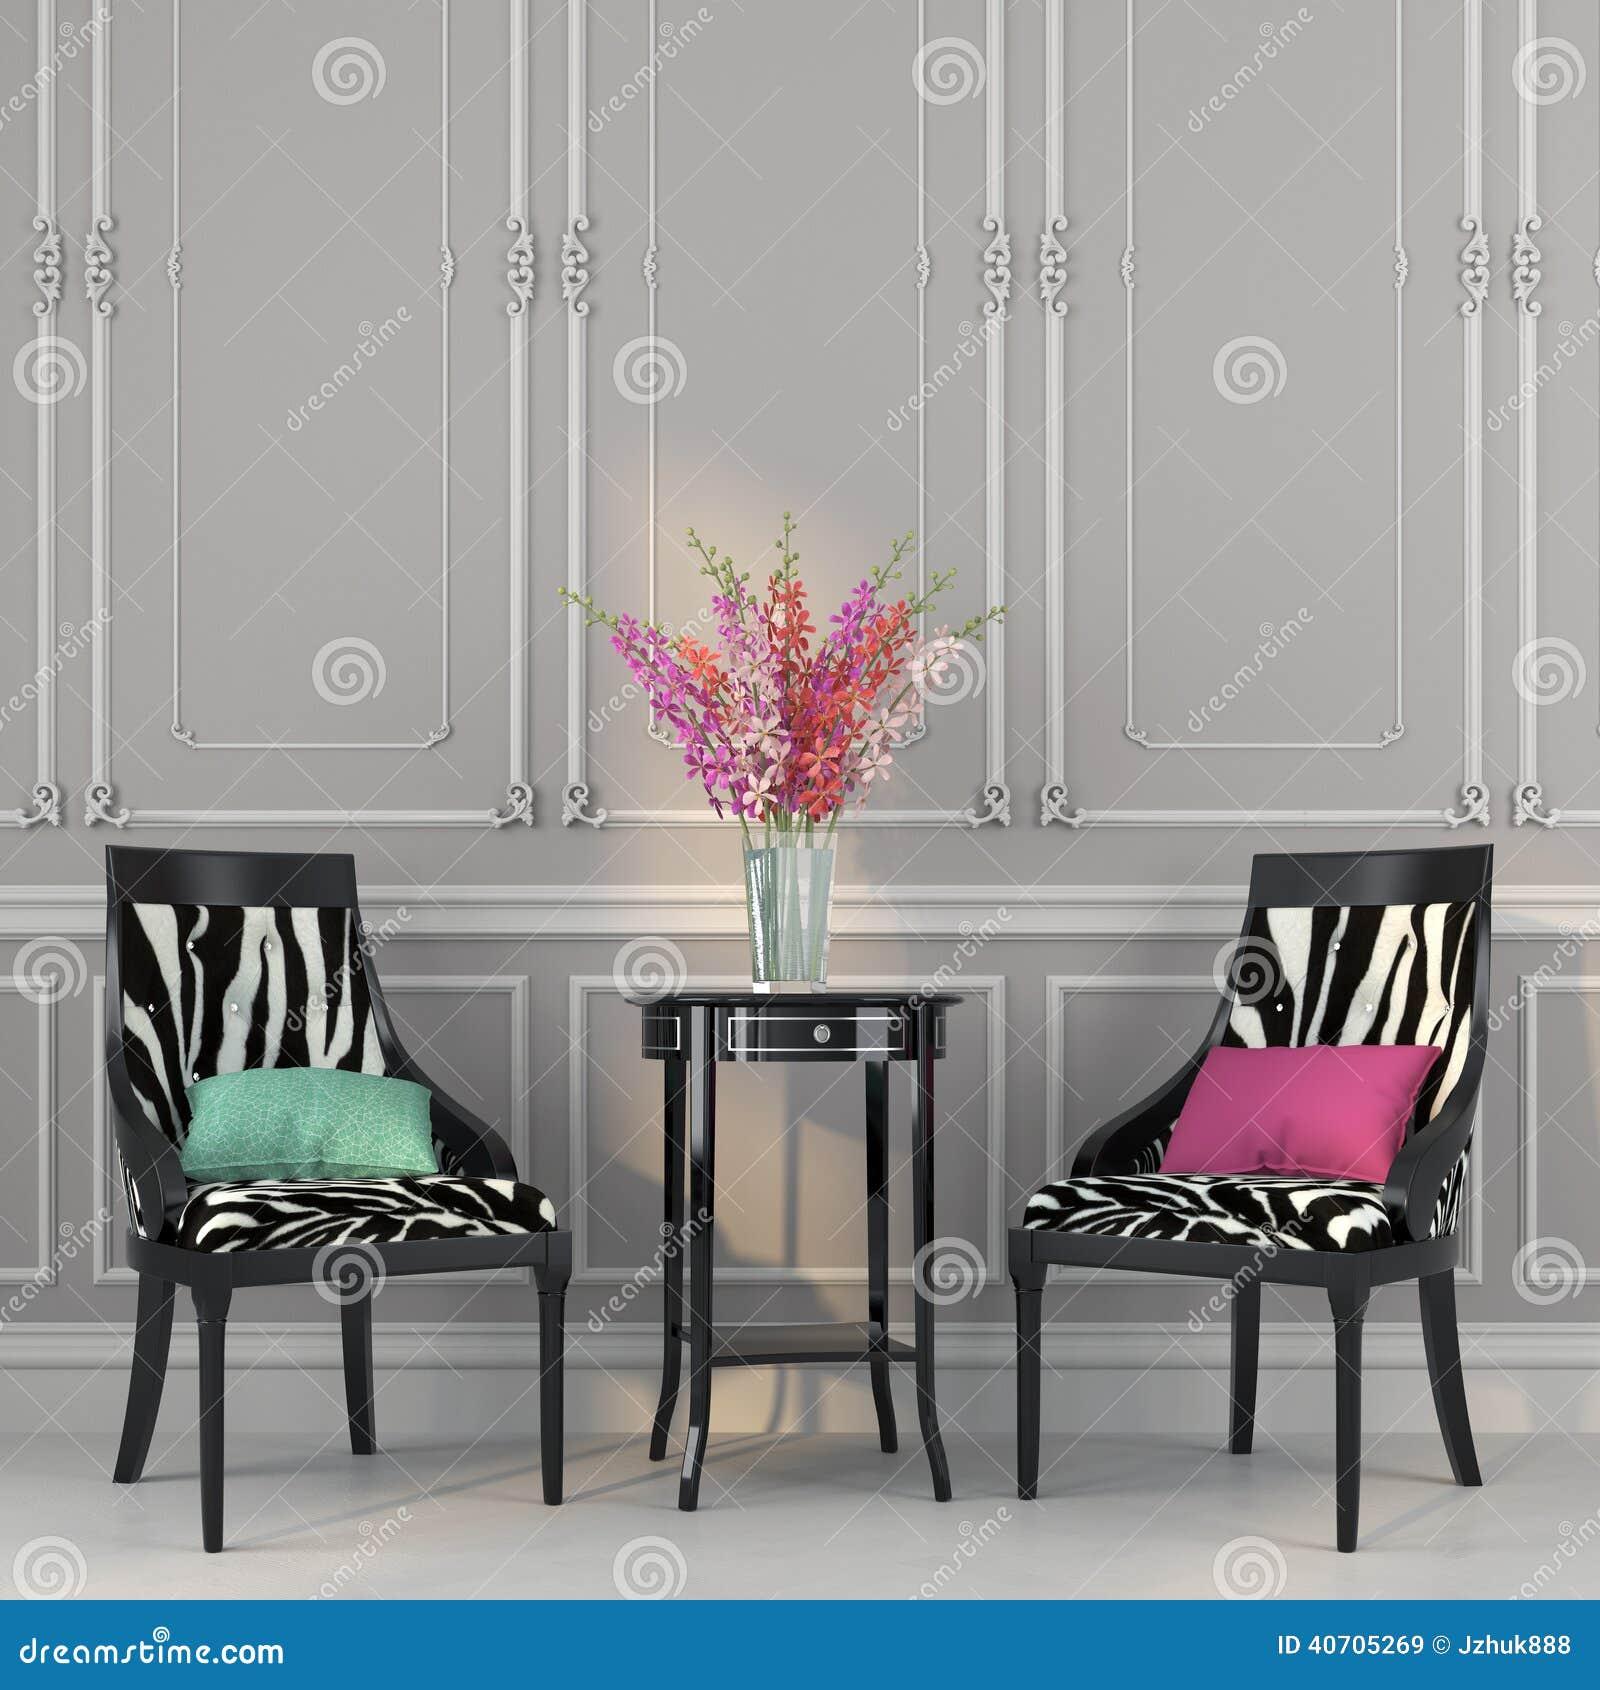 Two Chairs With Zebra Print And A Table Stock Photo. Yellow Kitchenaid. Small Kitchen Sinks Ikea. Kosher Kitchen Organization. Old House Kitchen Remodel. Small Kitchen With Pantry. Kitchen Pantry Lazy Susan. Kitchen Glass Hood. Kitchen Glass Jars India